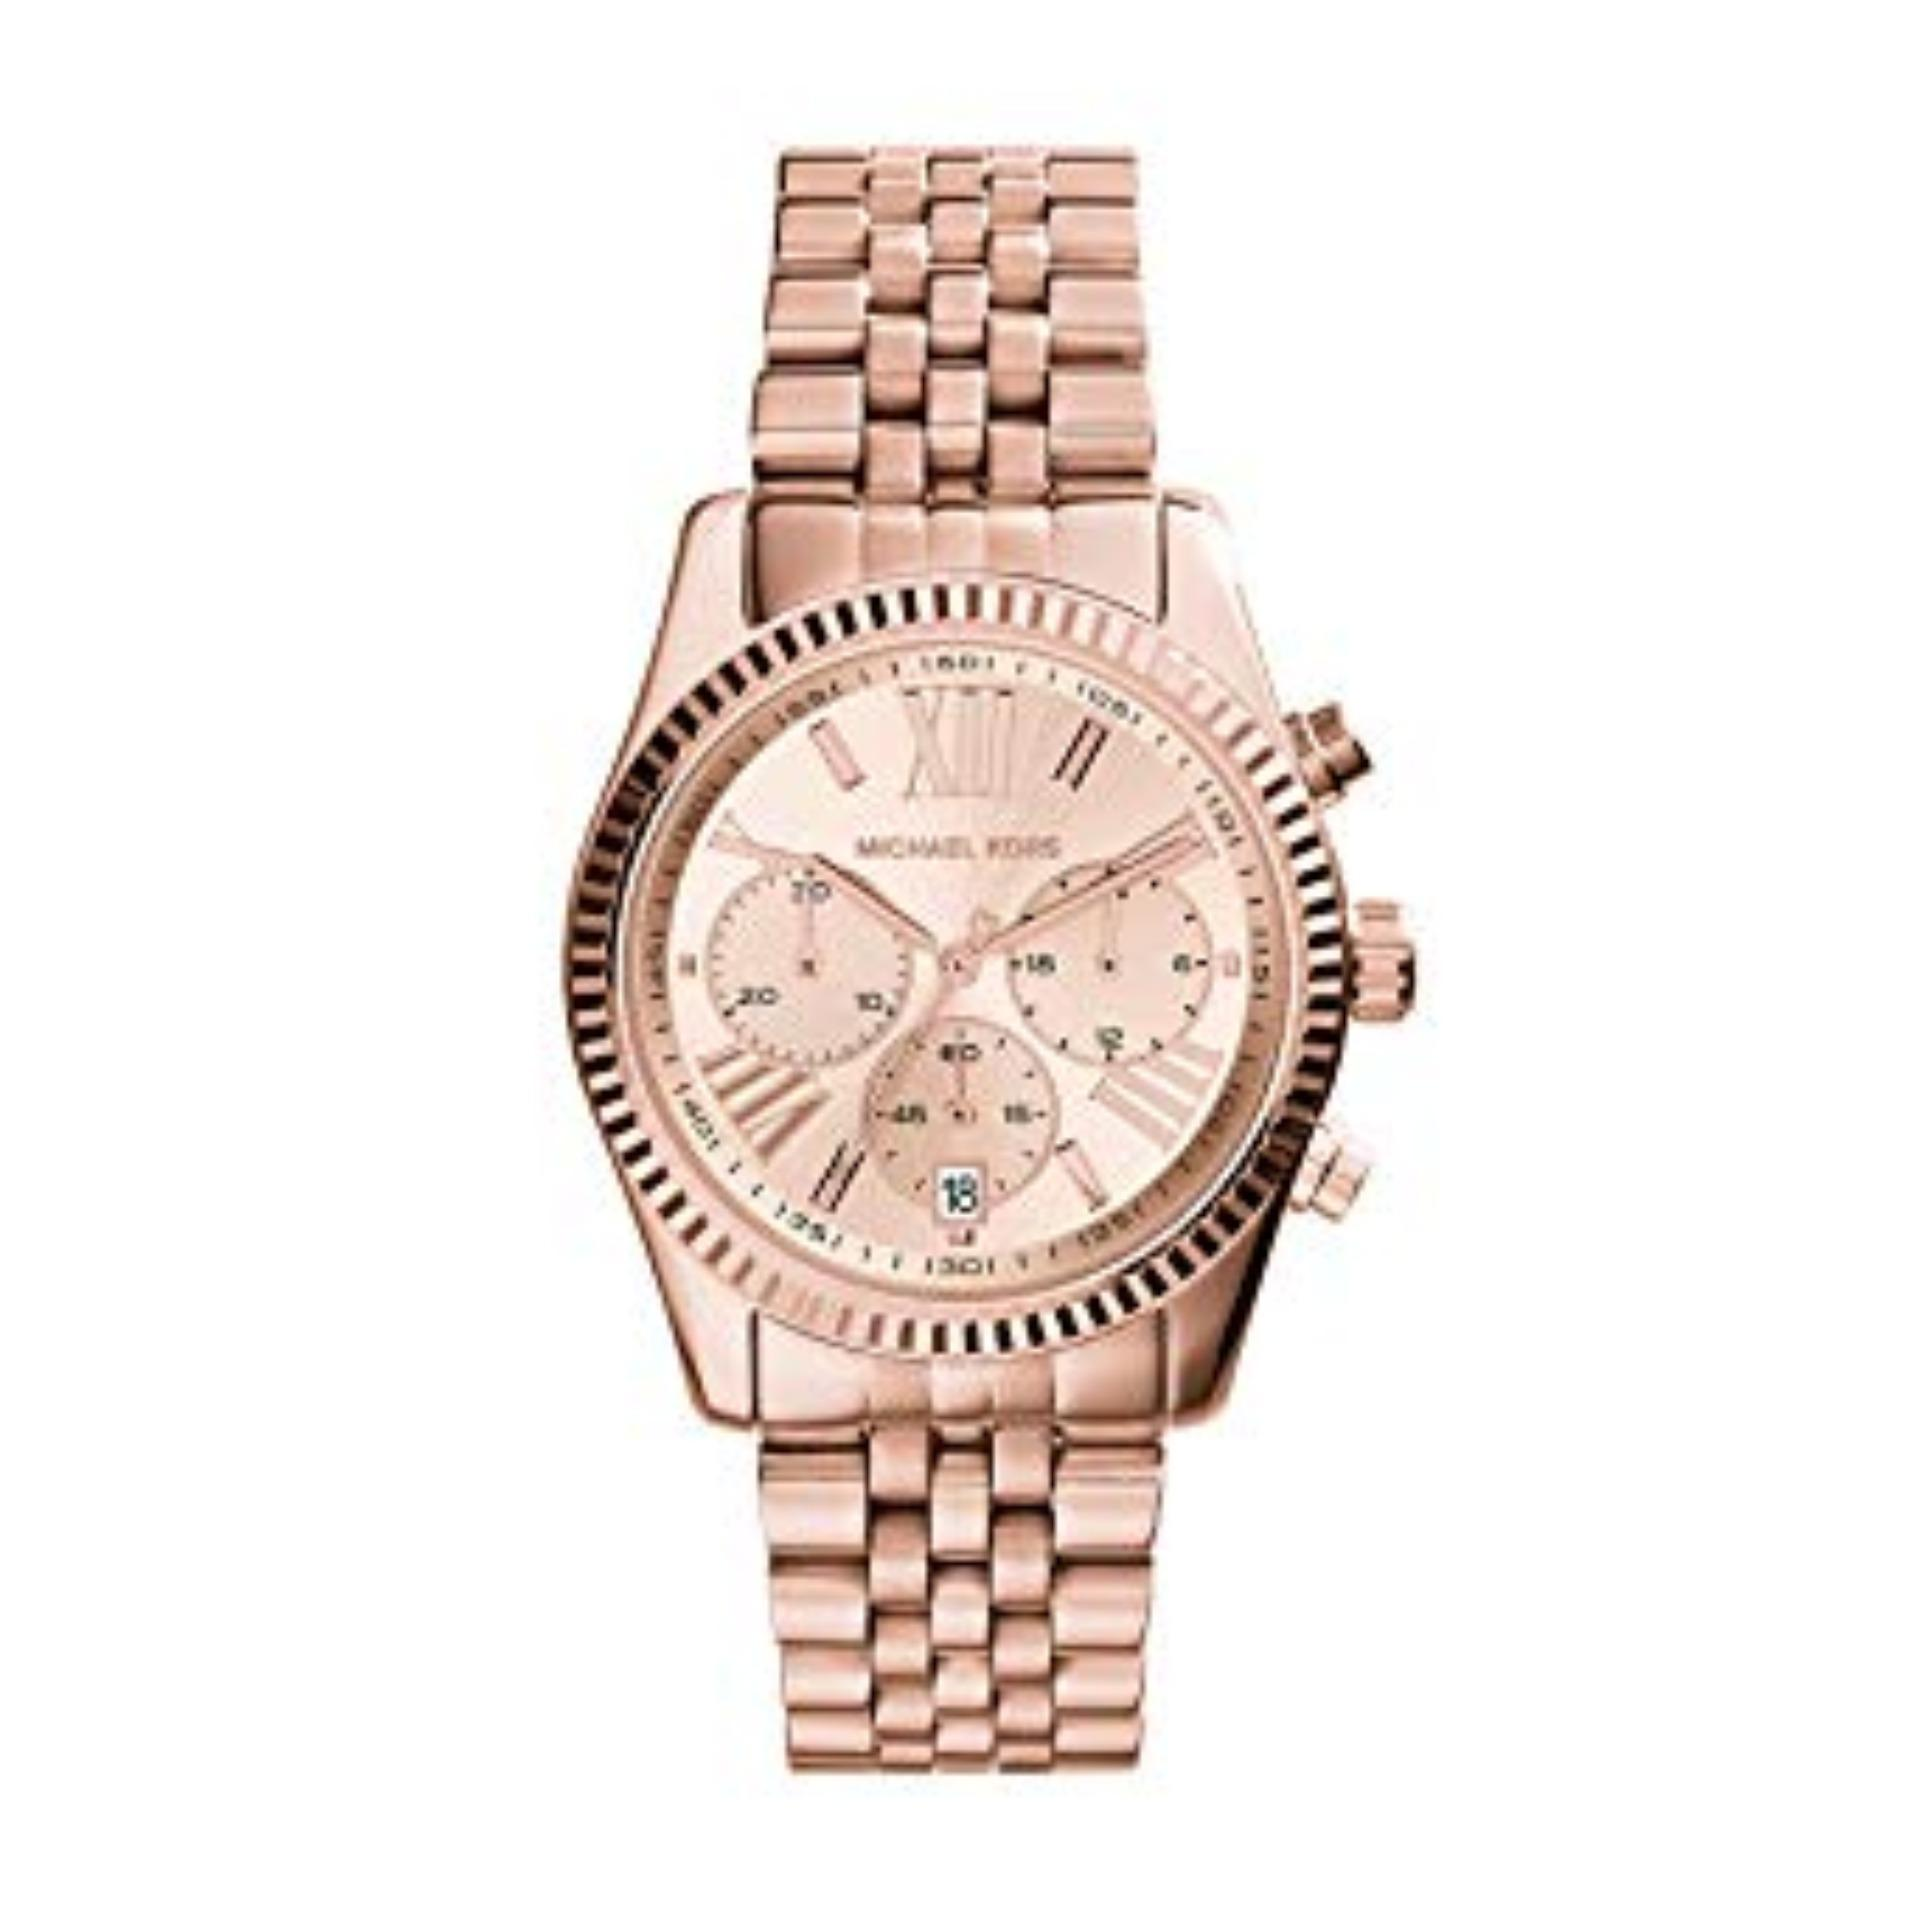 f6f88599baf25 Singapore. Michael Kors Lexington Women s Rose Gold Stainless Steel Strap  Watch MK5569